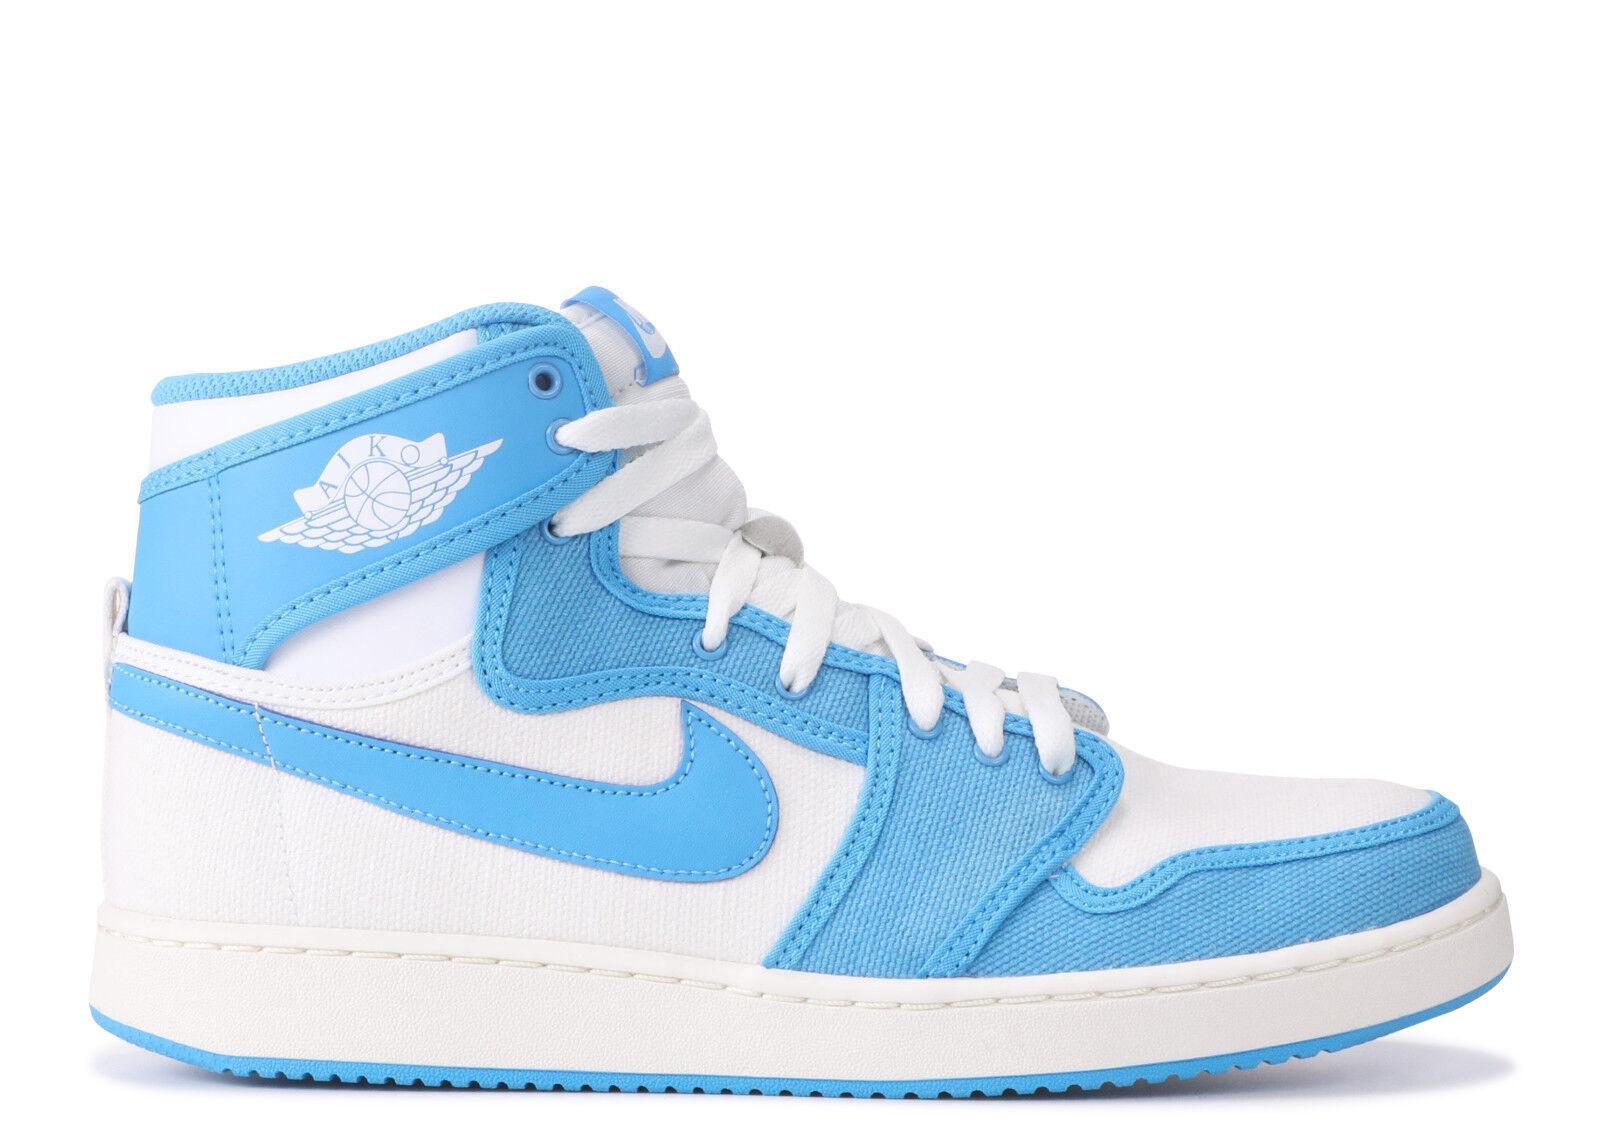 Nike air jordan 1 aj ko hohe hohe hohe unc tar heels größe 14.655328 900 677495